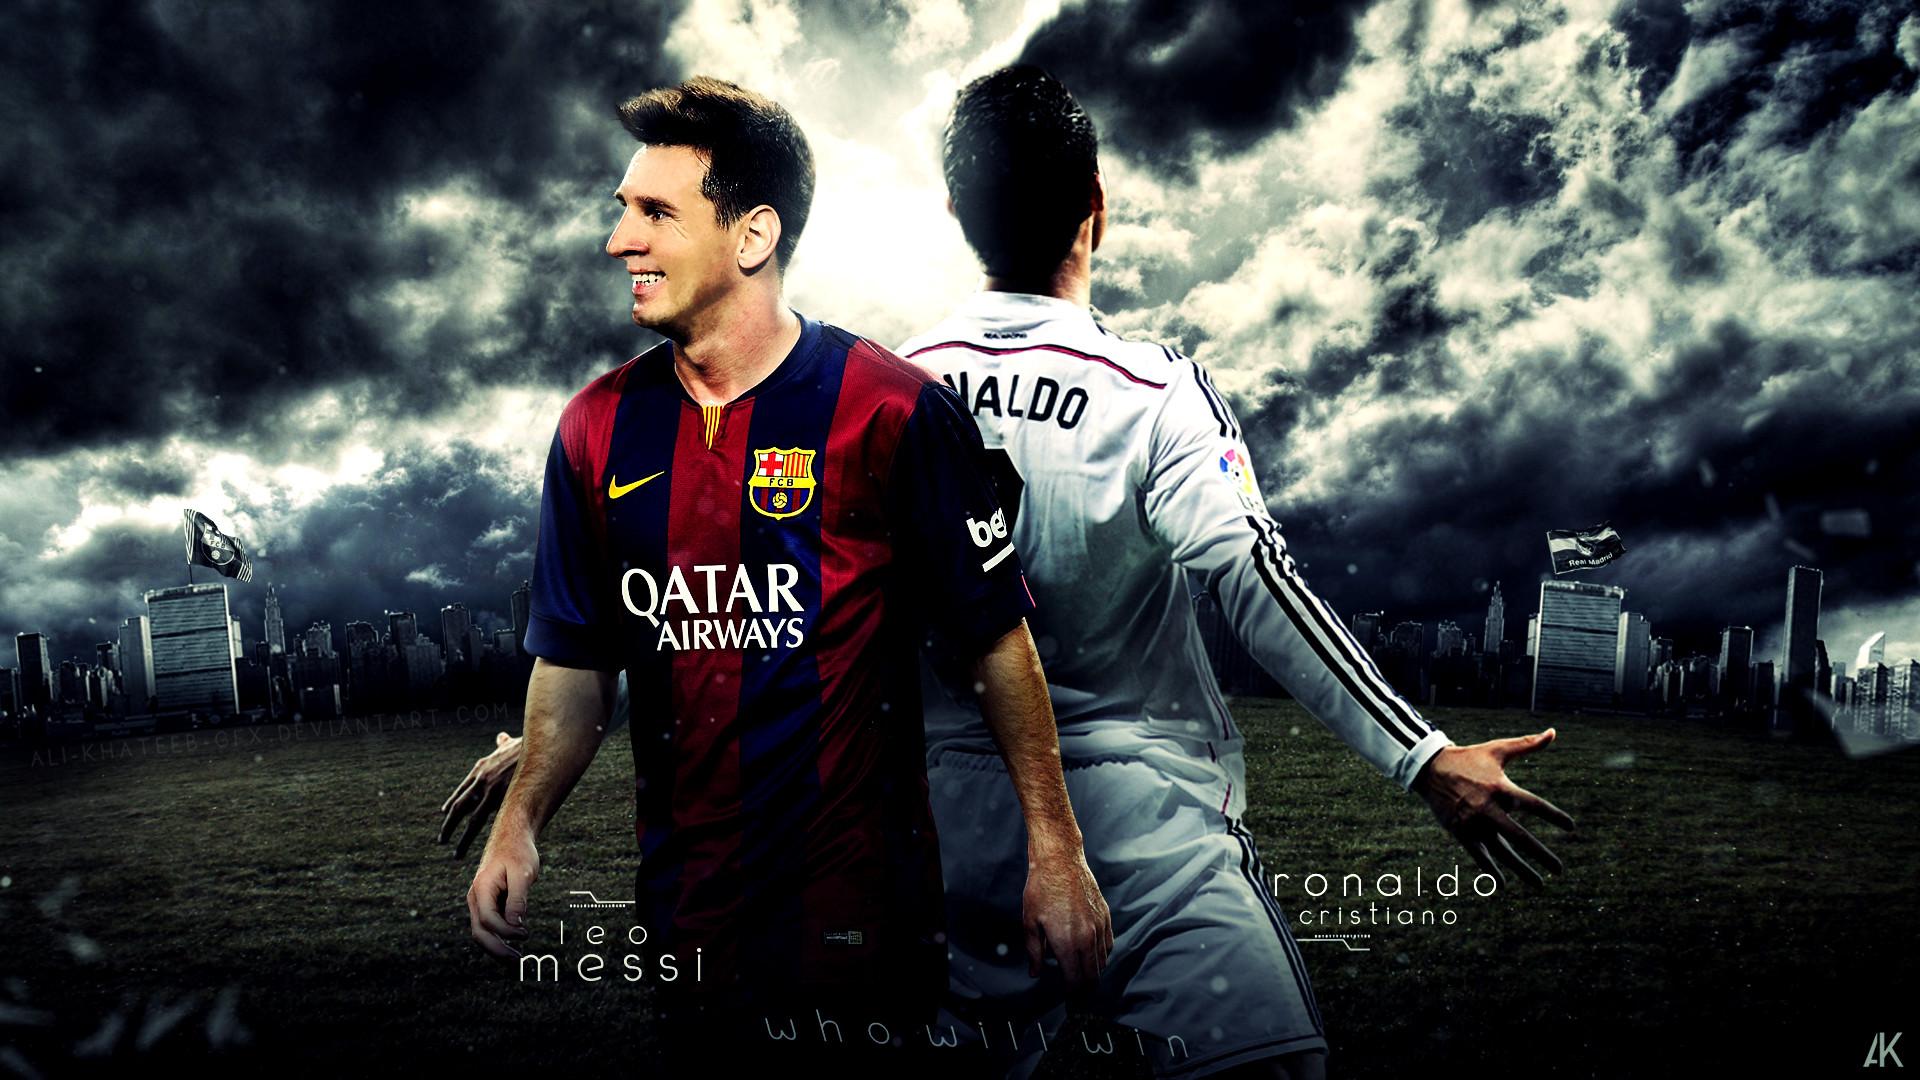 2000x1326 Cristiano Ronaldo HD WallpaperImagesPics Wallpapers Blog